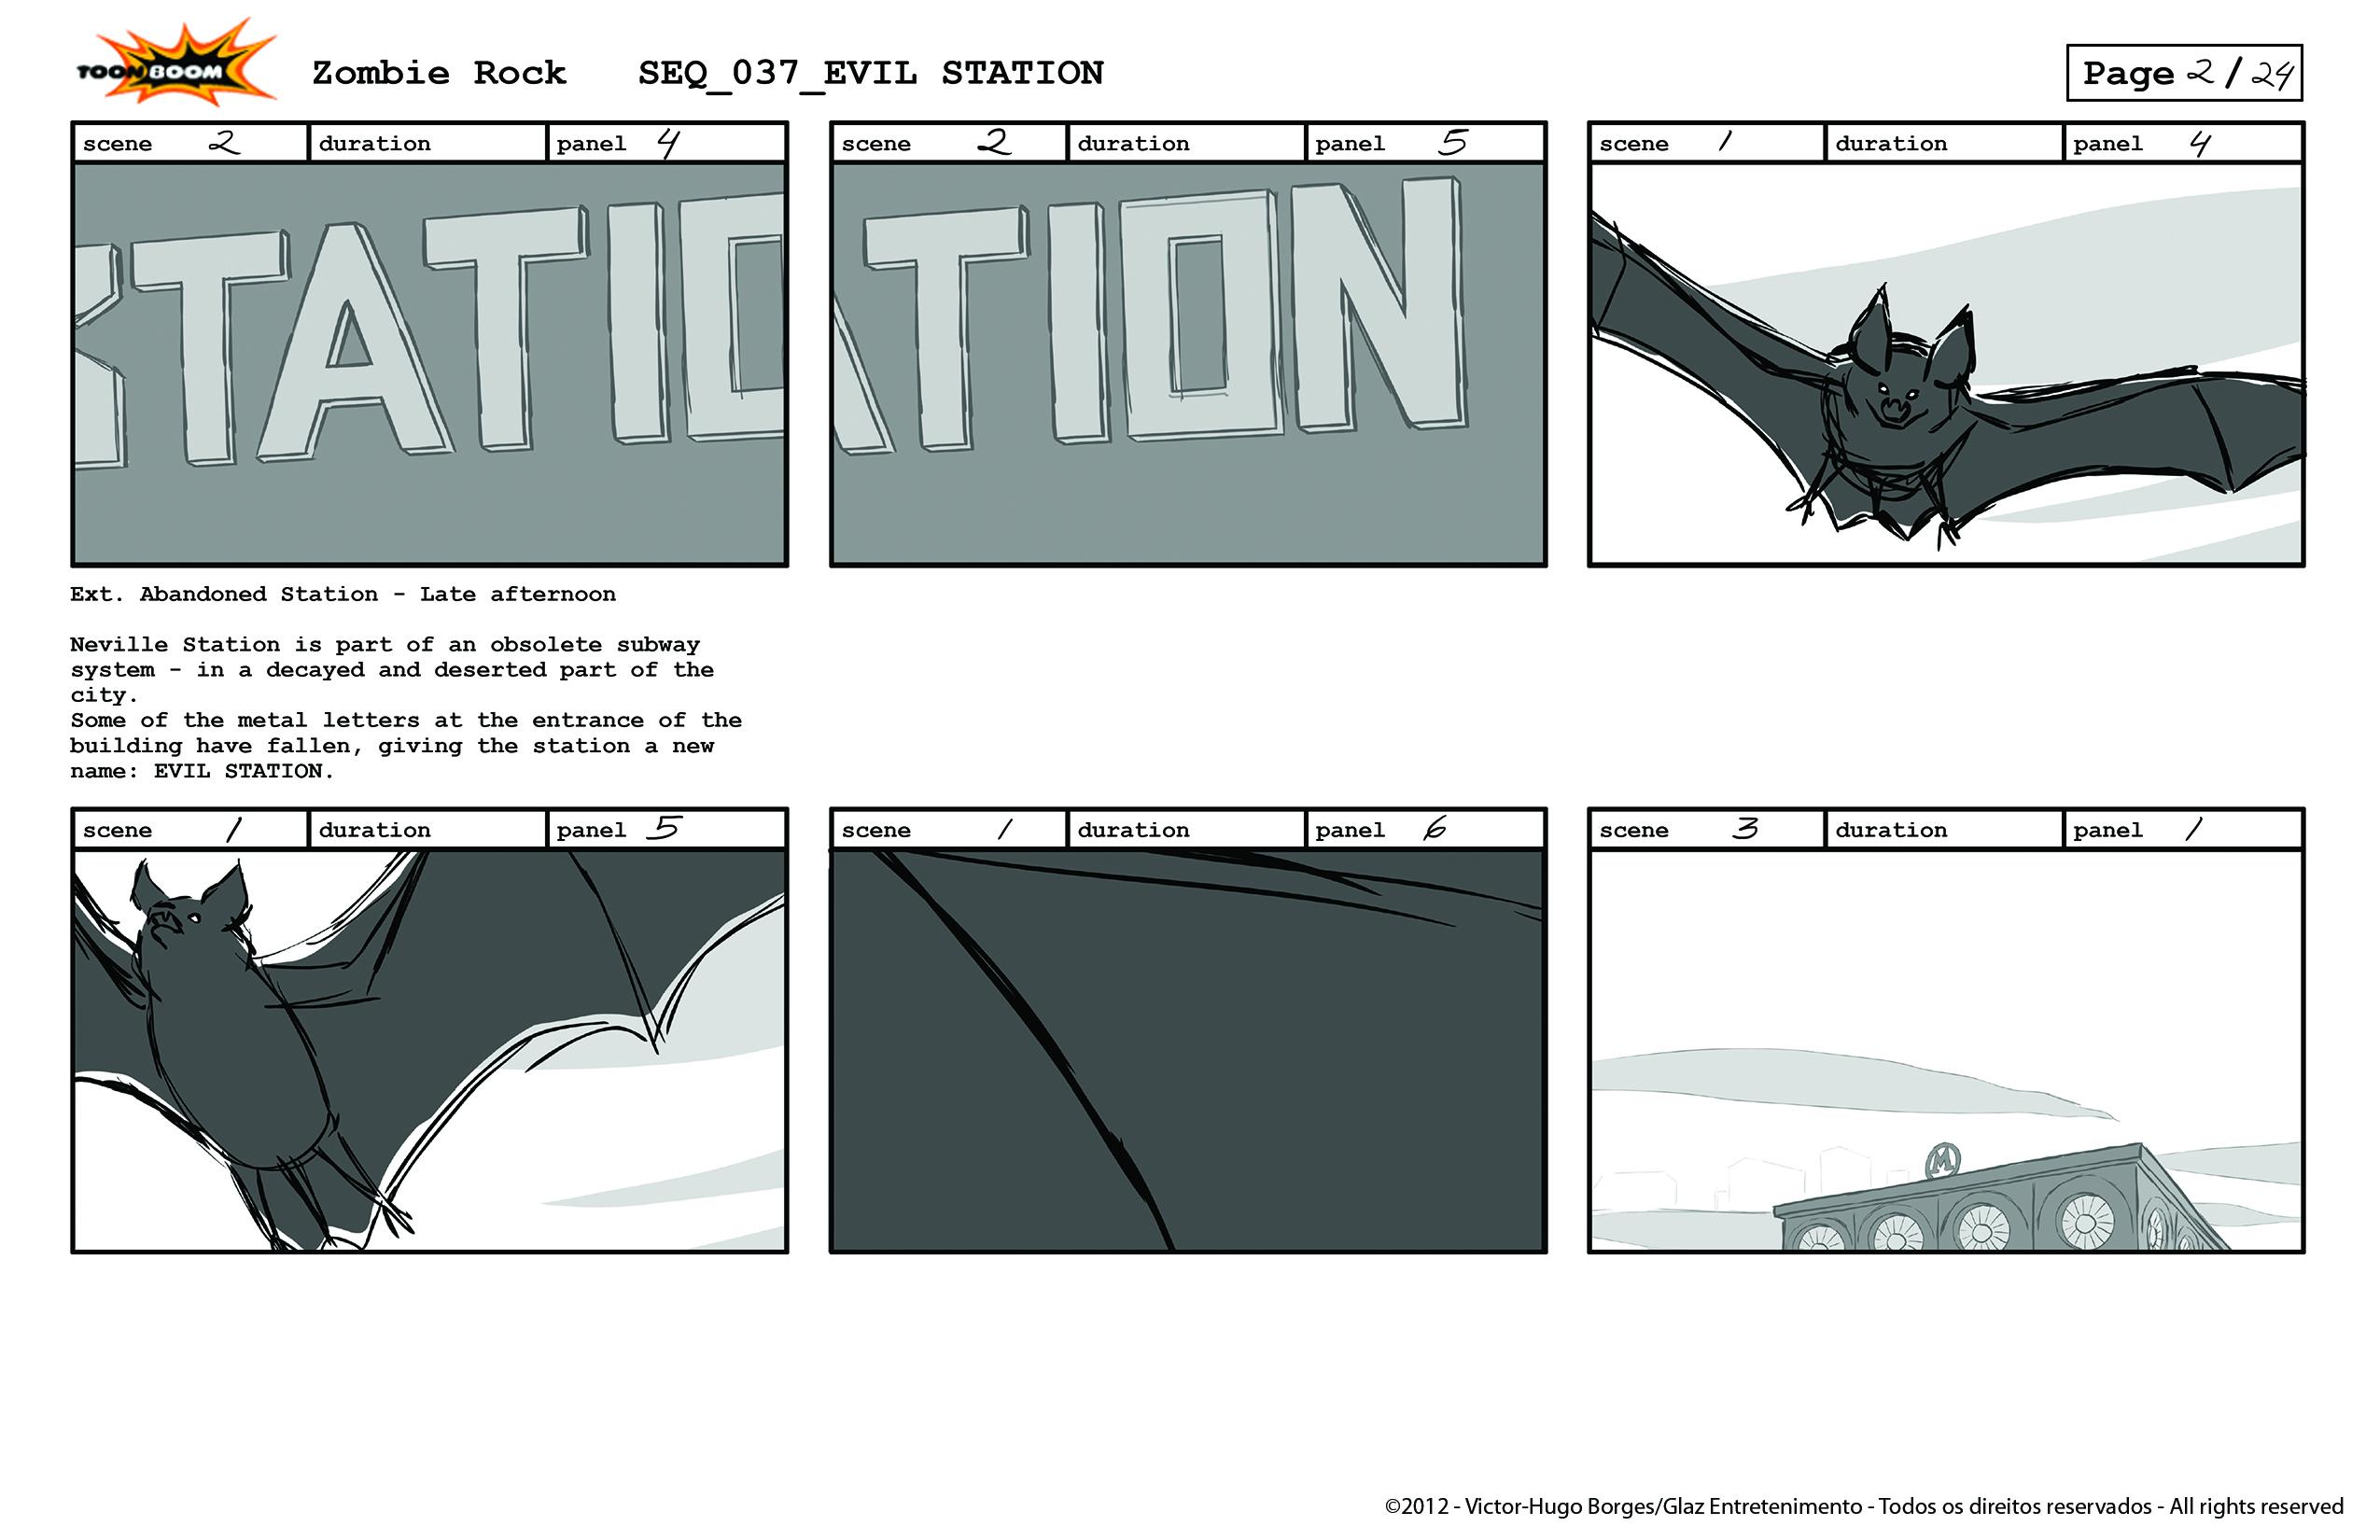 SEQ037_Evil Station_page02